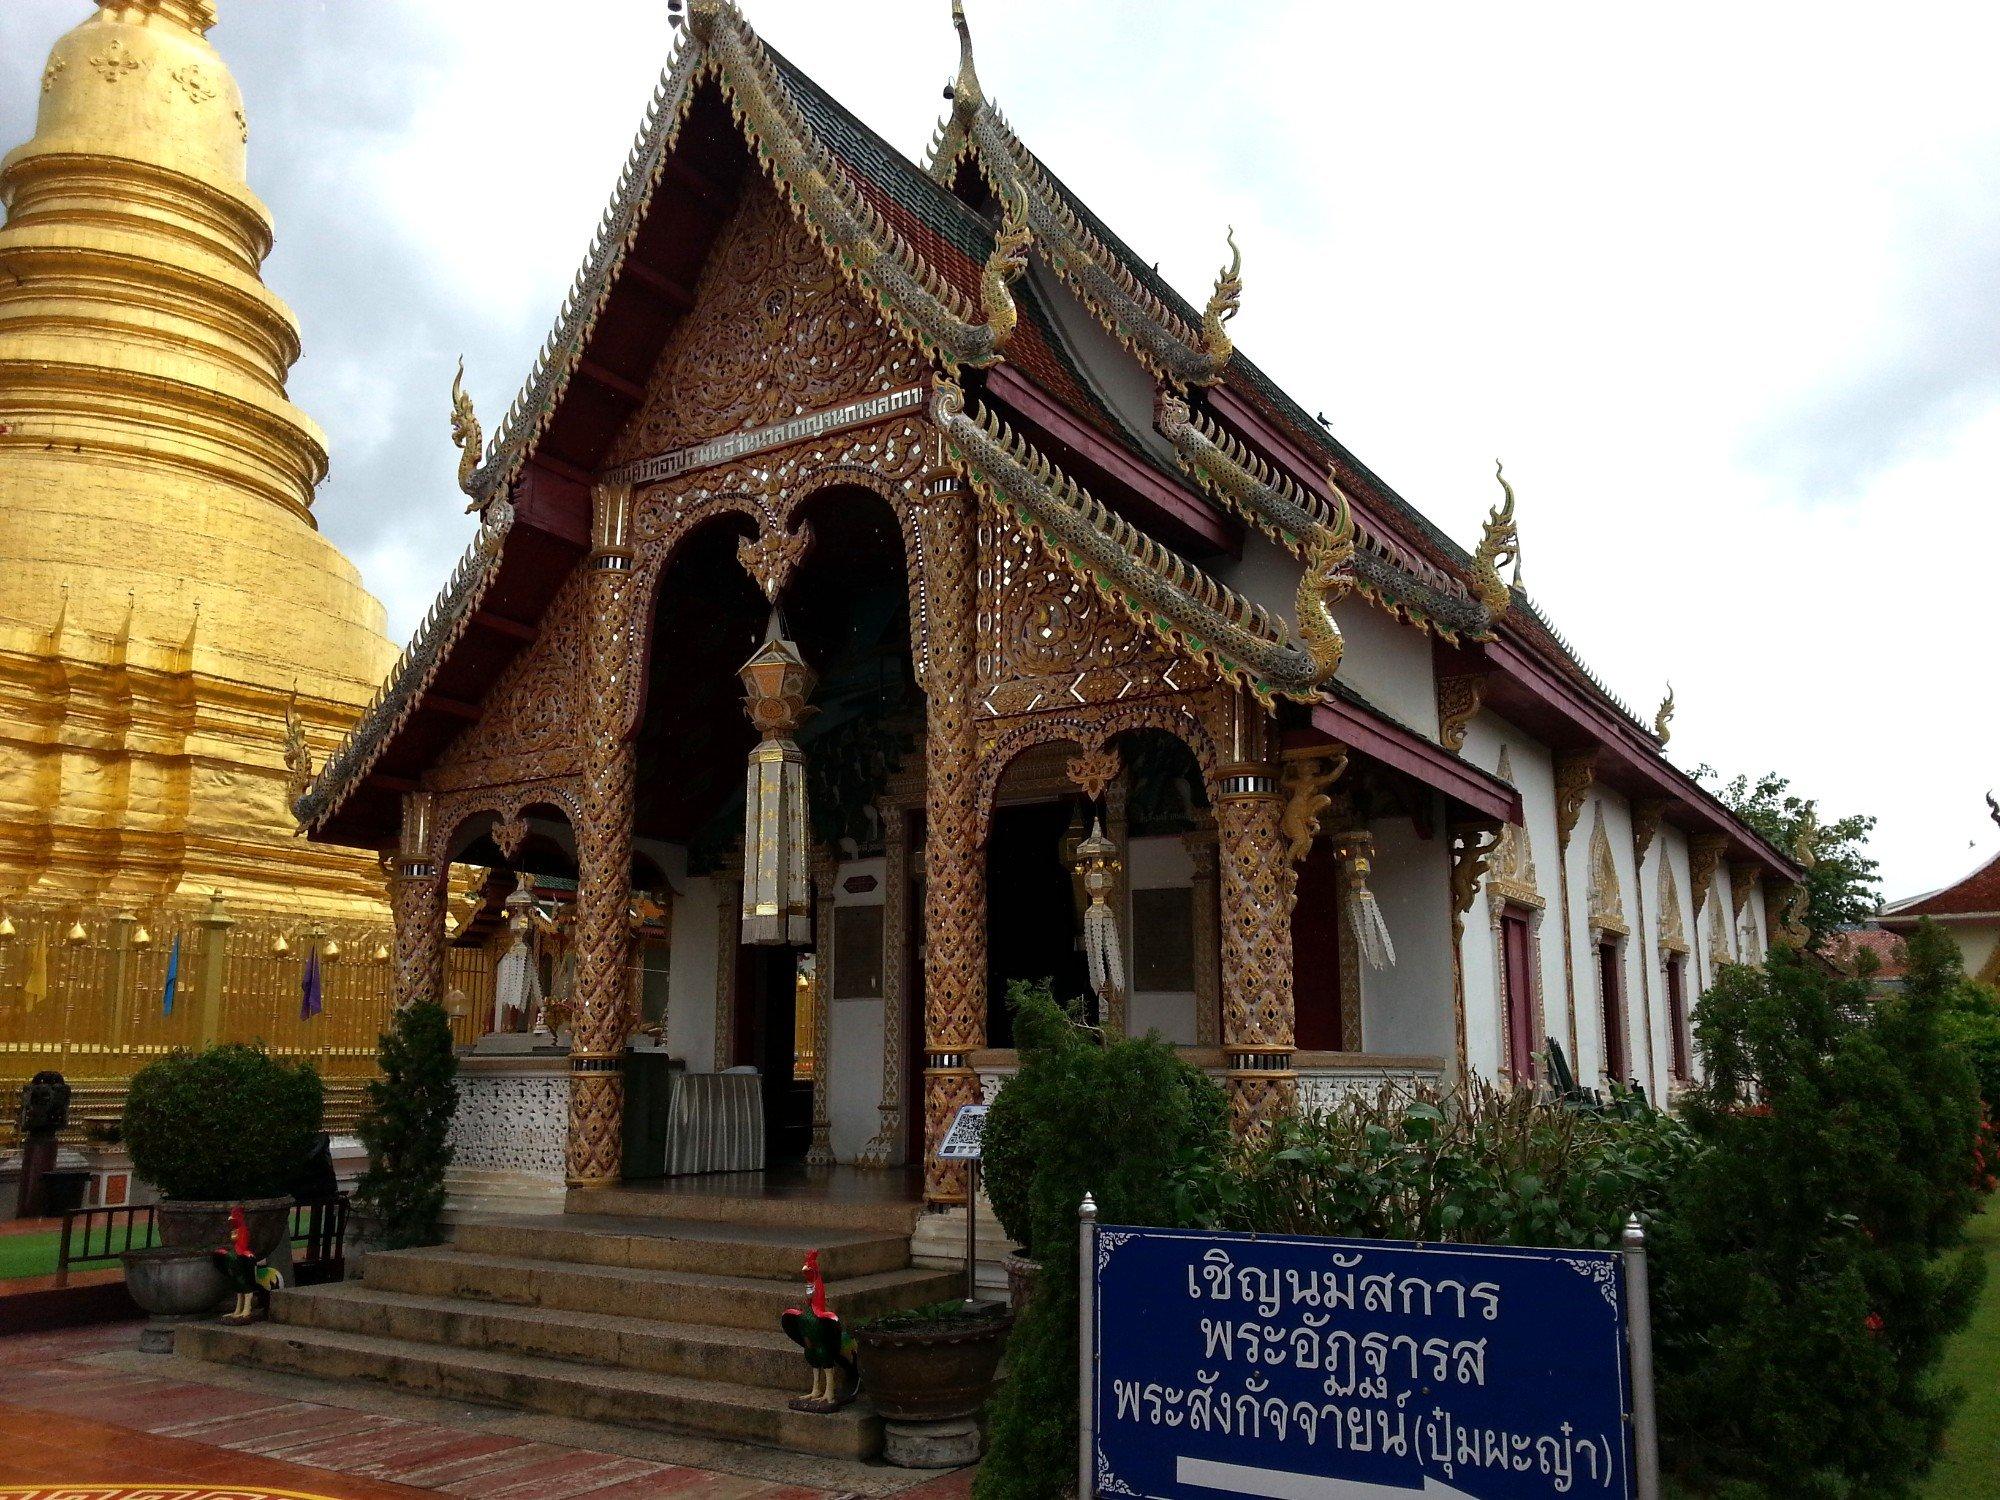 Smaller assembly hall at Wat Phra That Hariphunchai